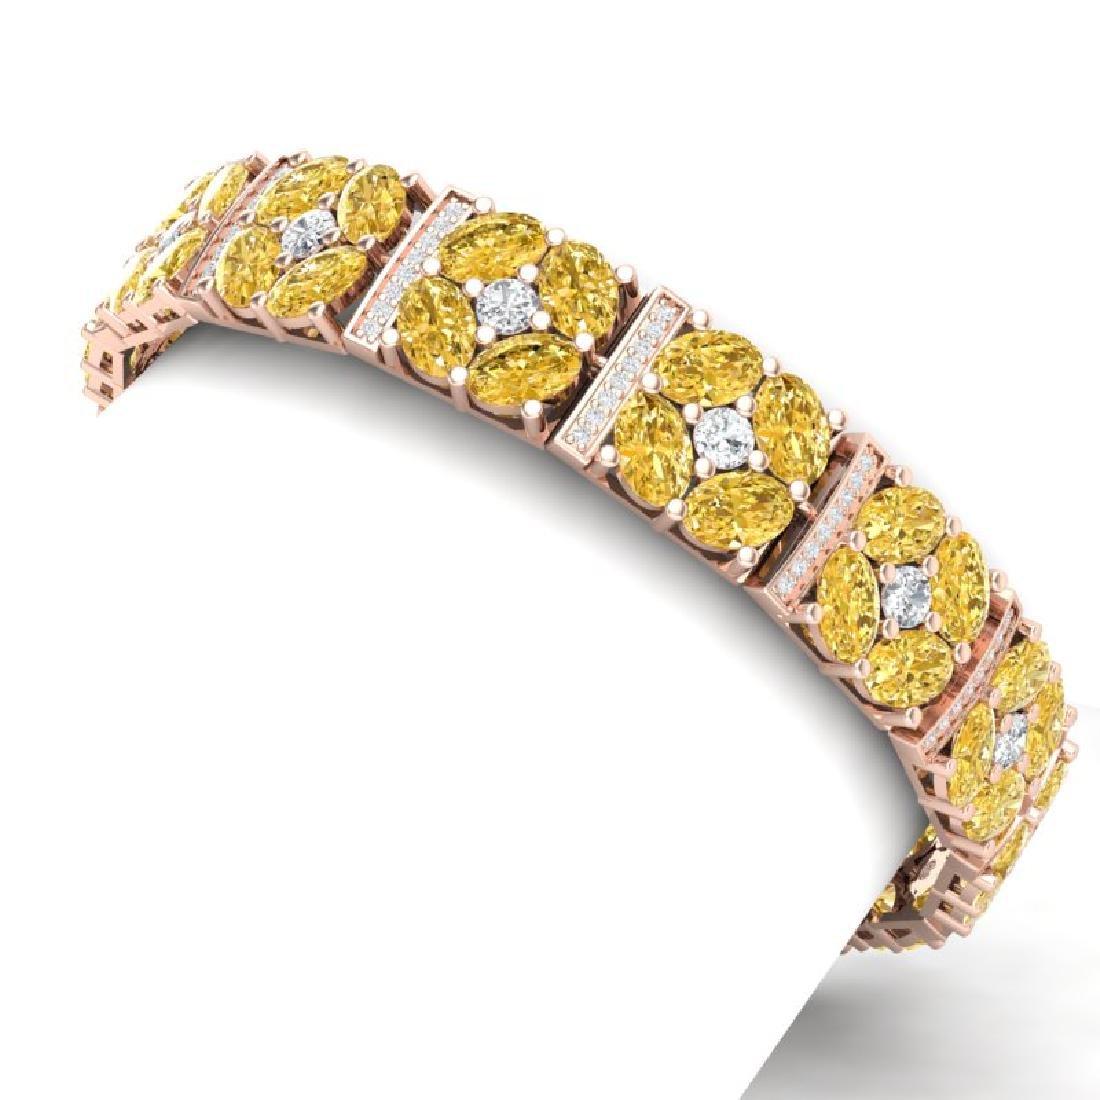 28.95 CTW Royalty Canary Citrine & VS Diamond Bracelet